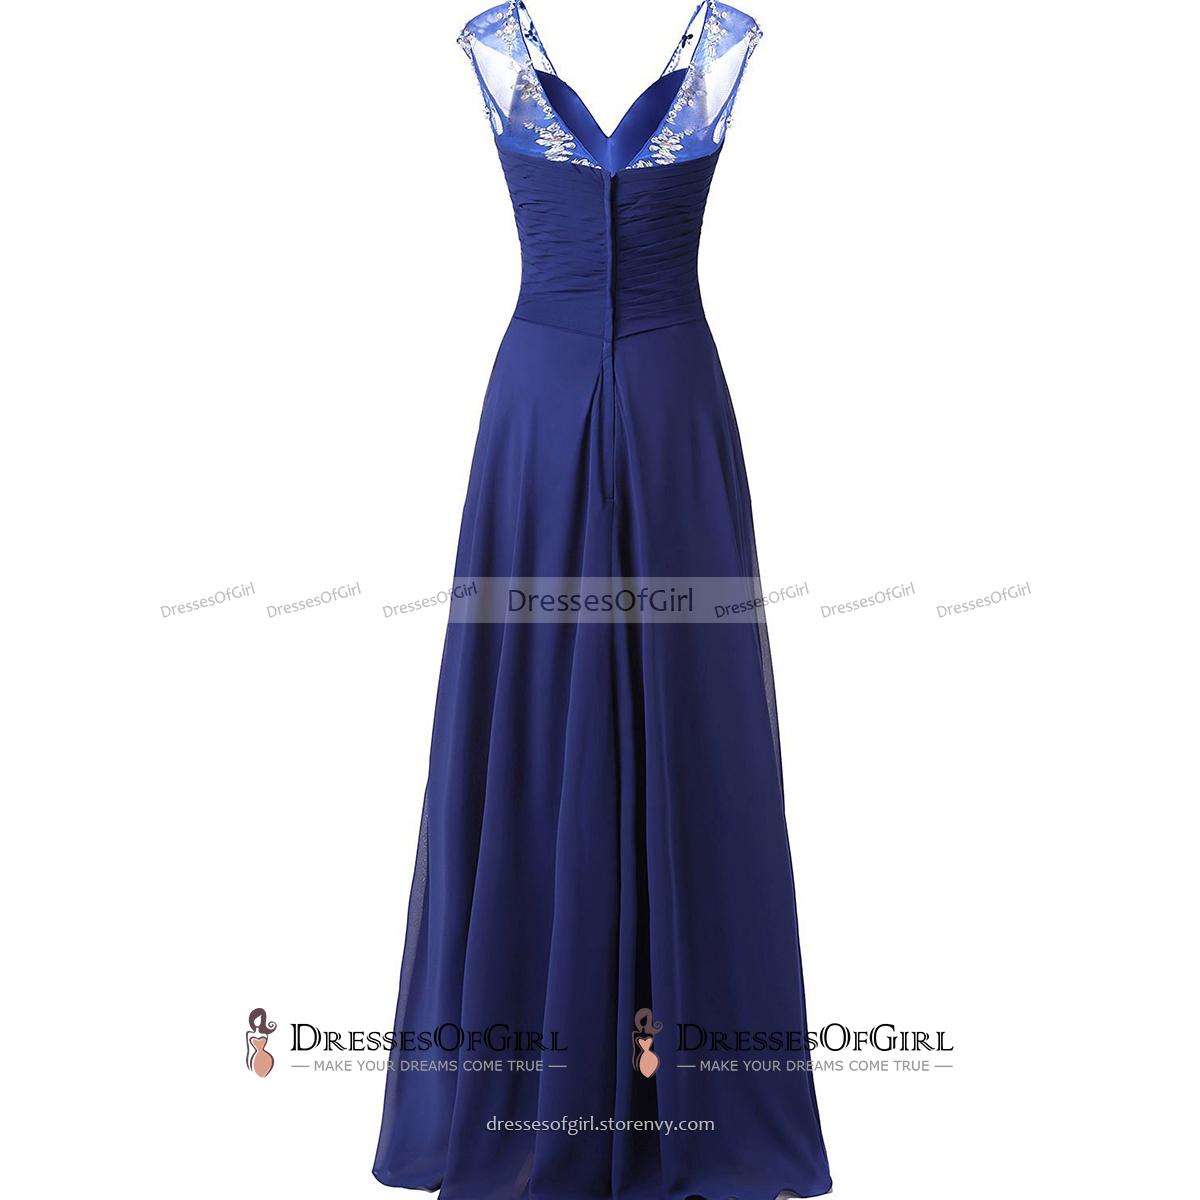 87d0f1338 Asymmetric A-line Long Prom Dress